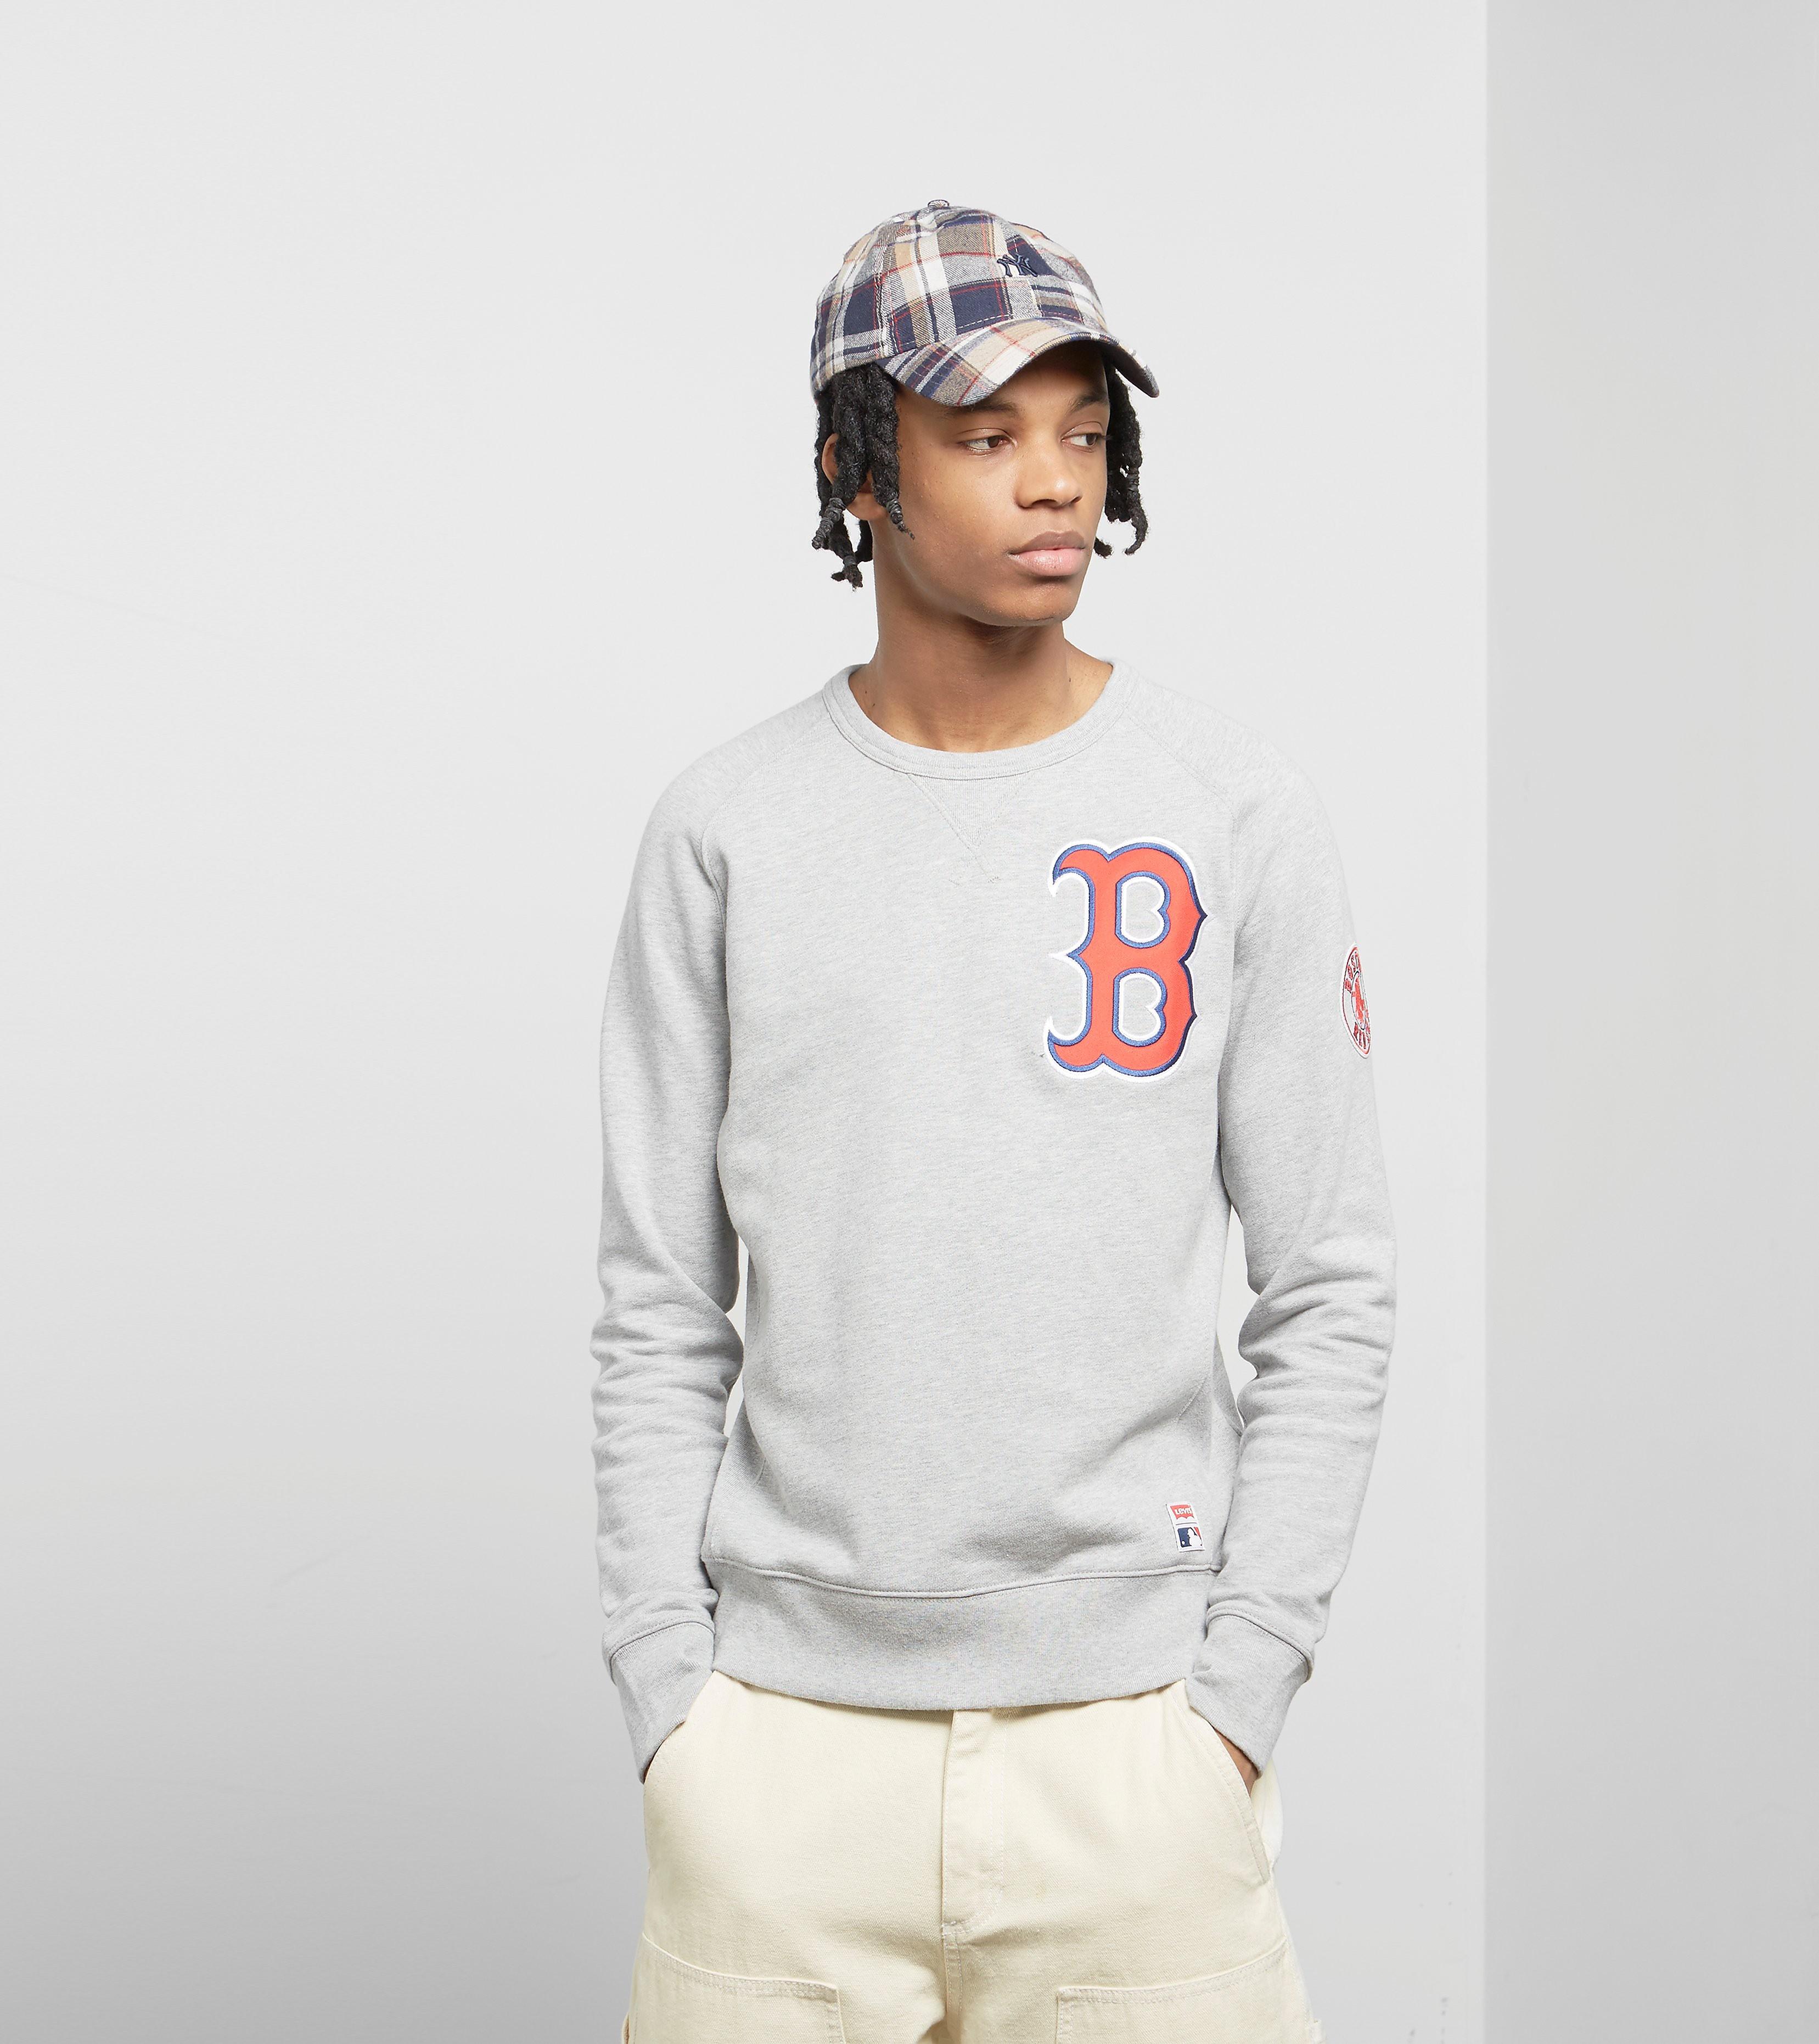 Levis x MLB Boston Red Sox Sweatshirt